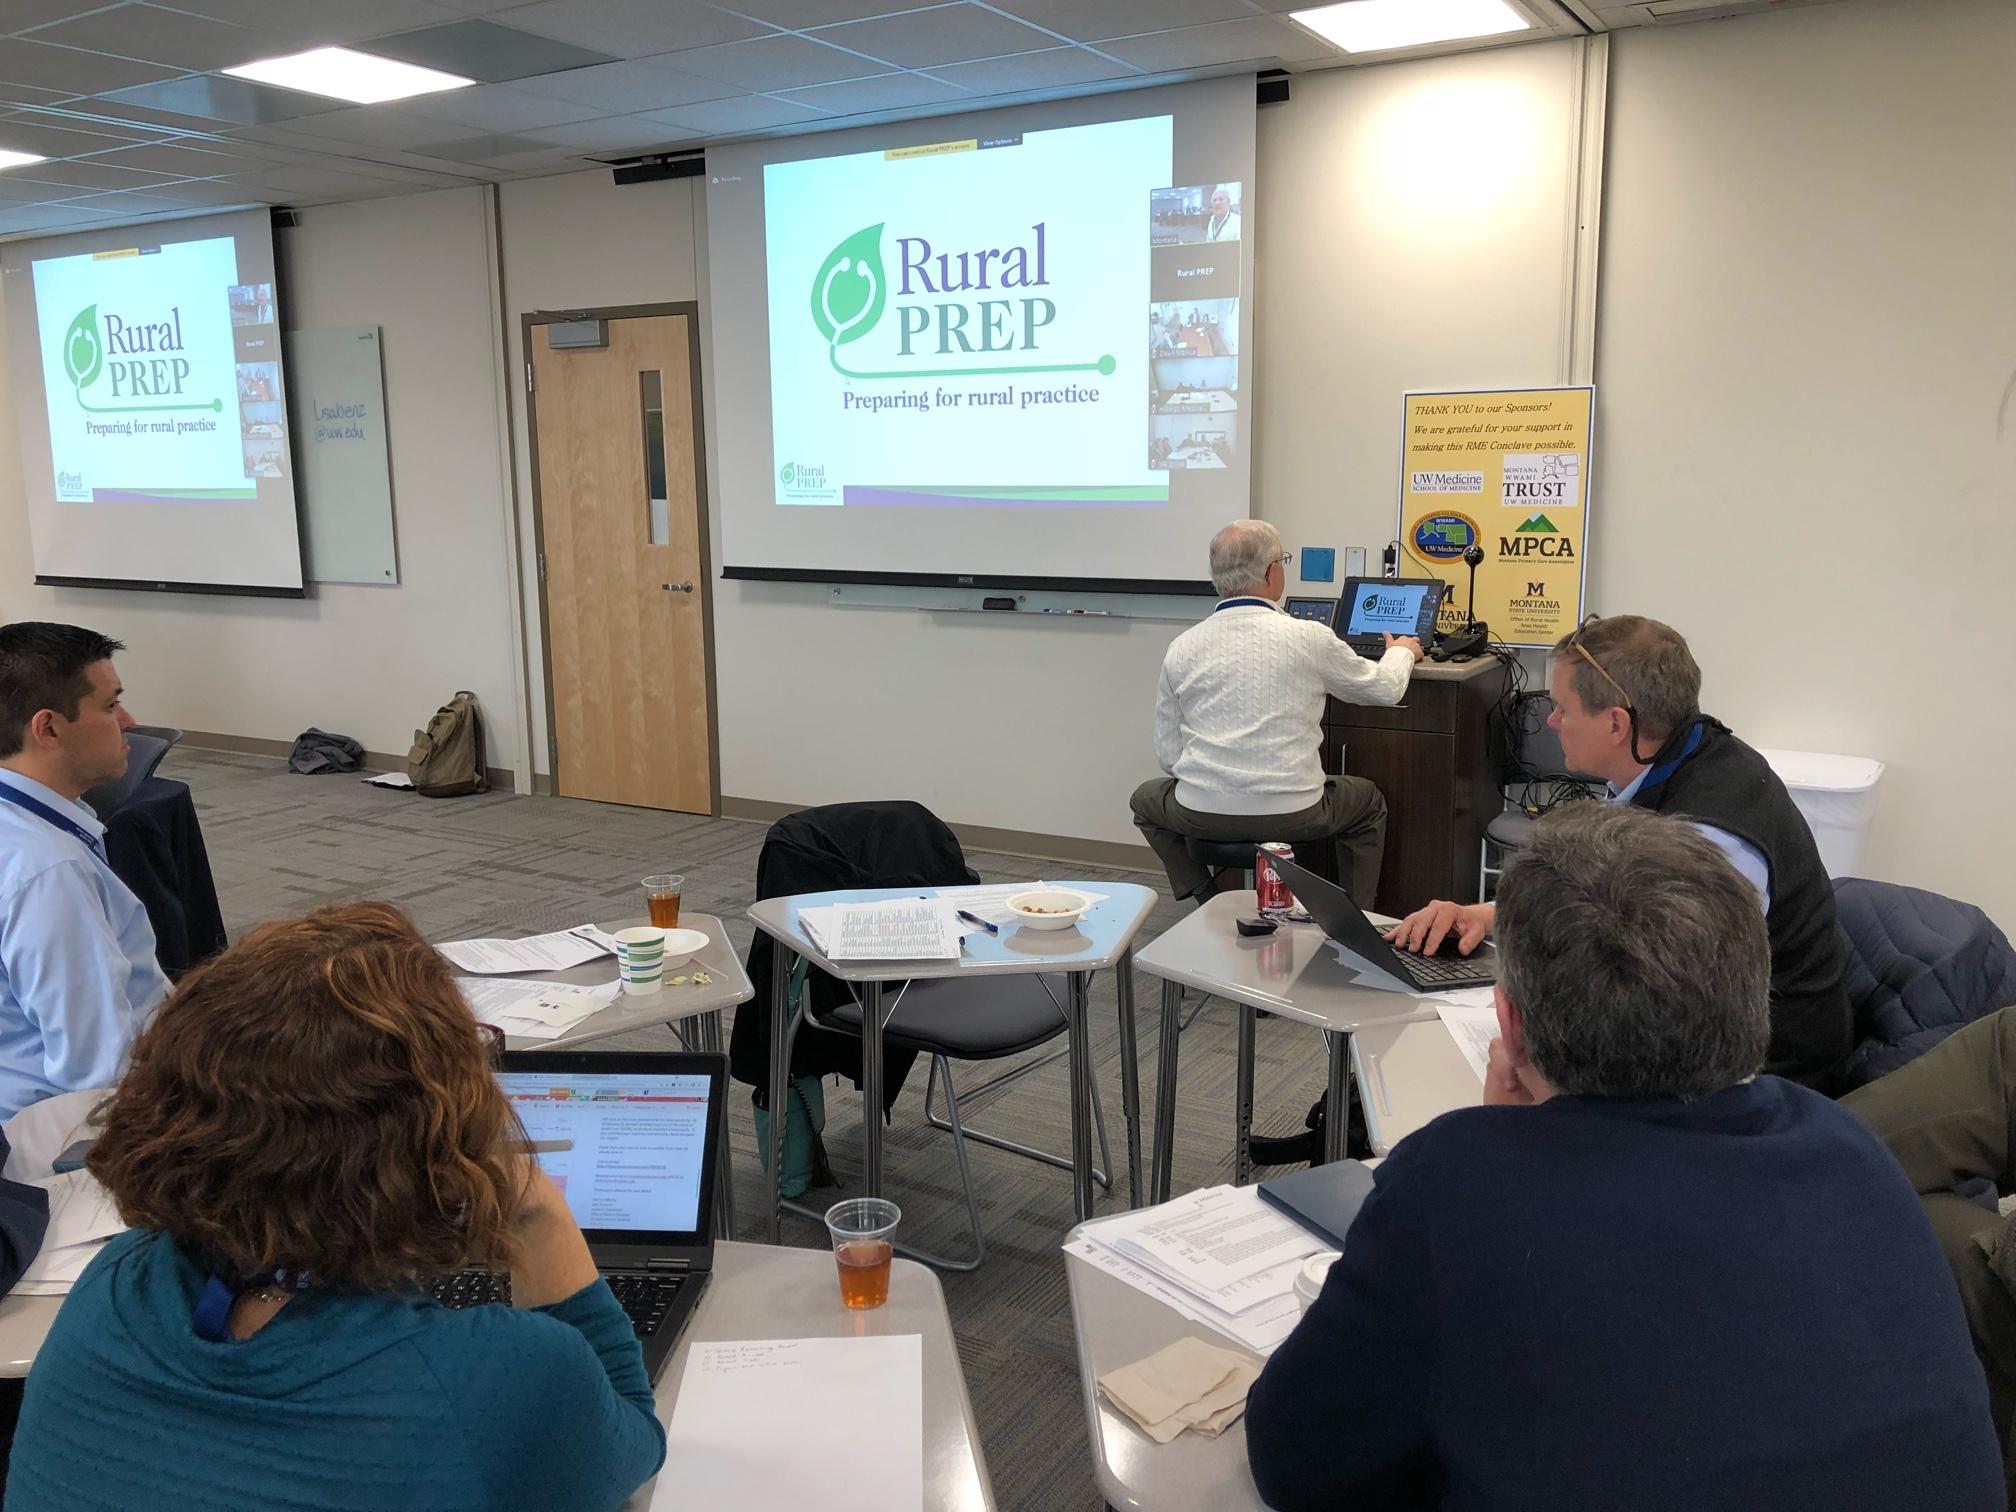 Randall Longenecker, MD, Rural PREP's Community of Practice Lead hosting the session.